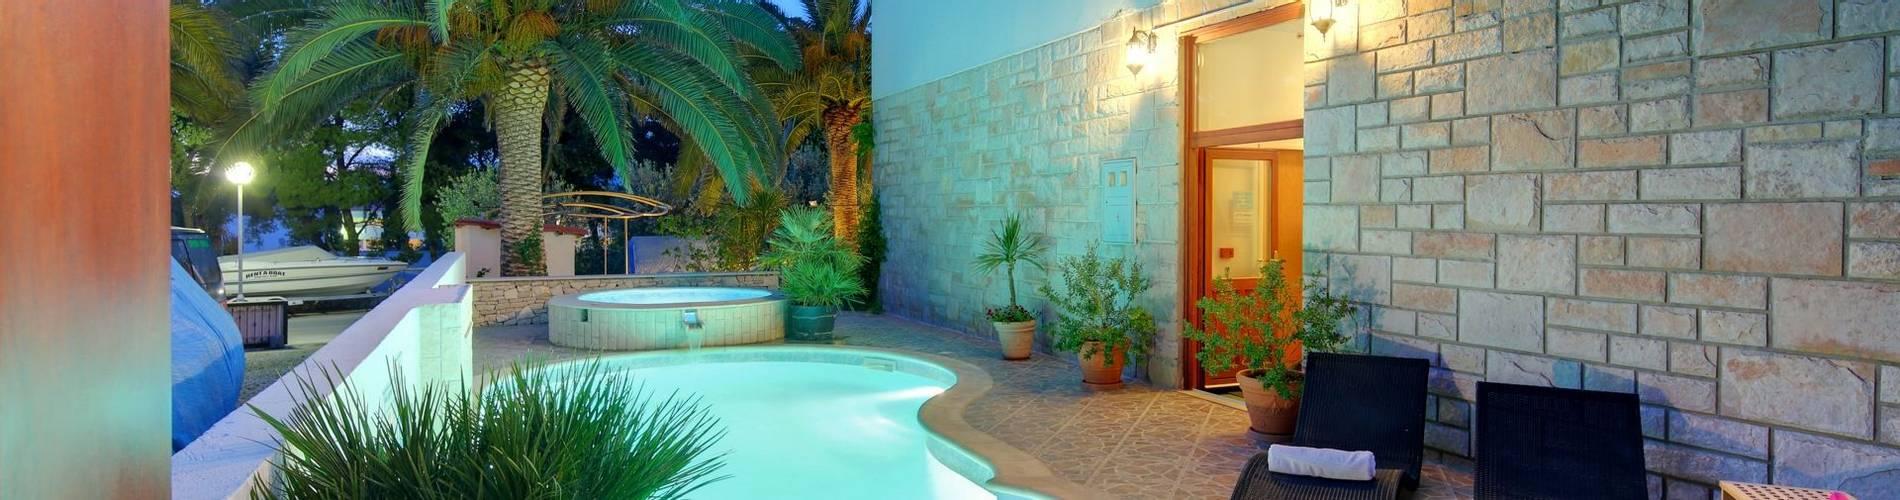 Hotel Villa ADRIATICA 2014 ZPool 1 6X4 16MB.JPG